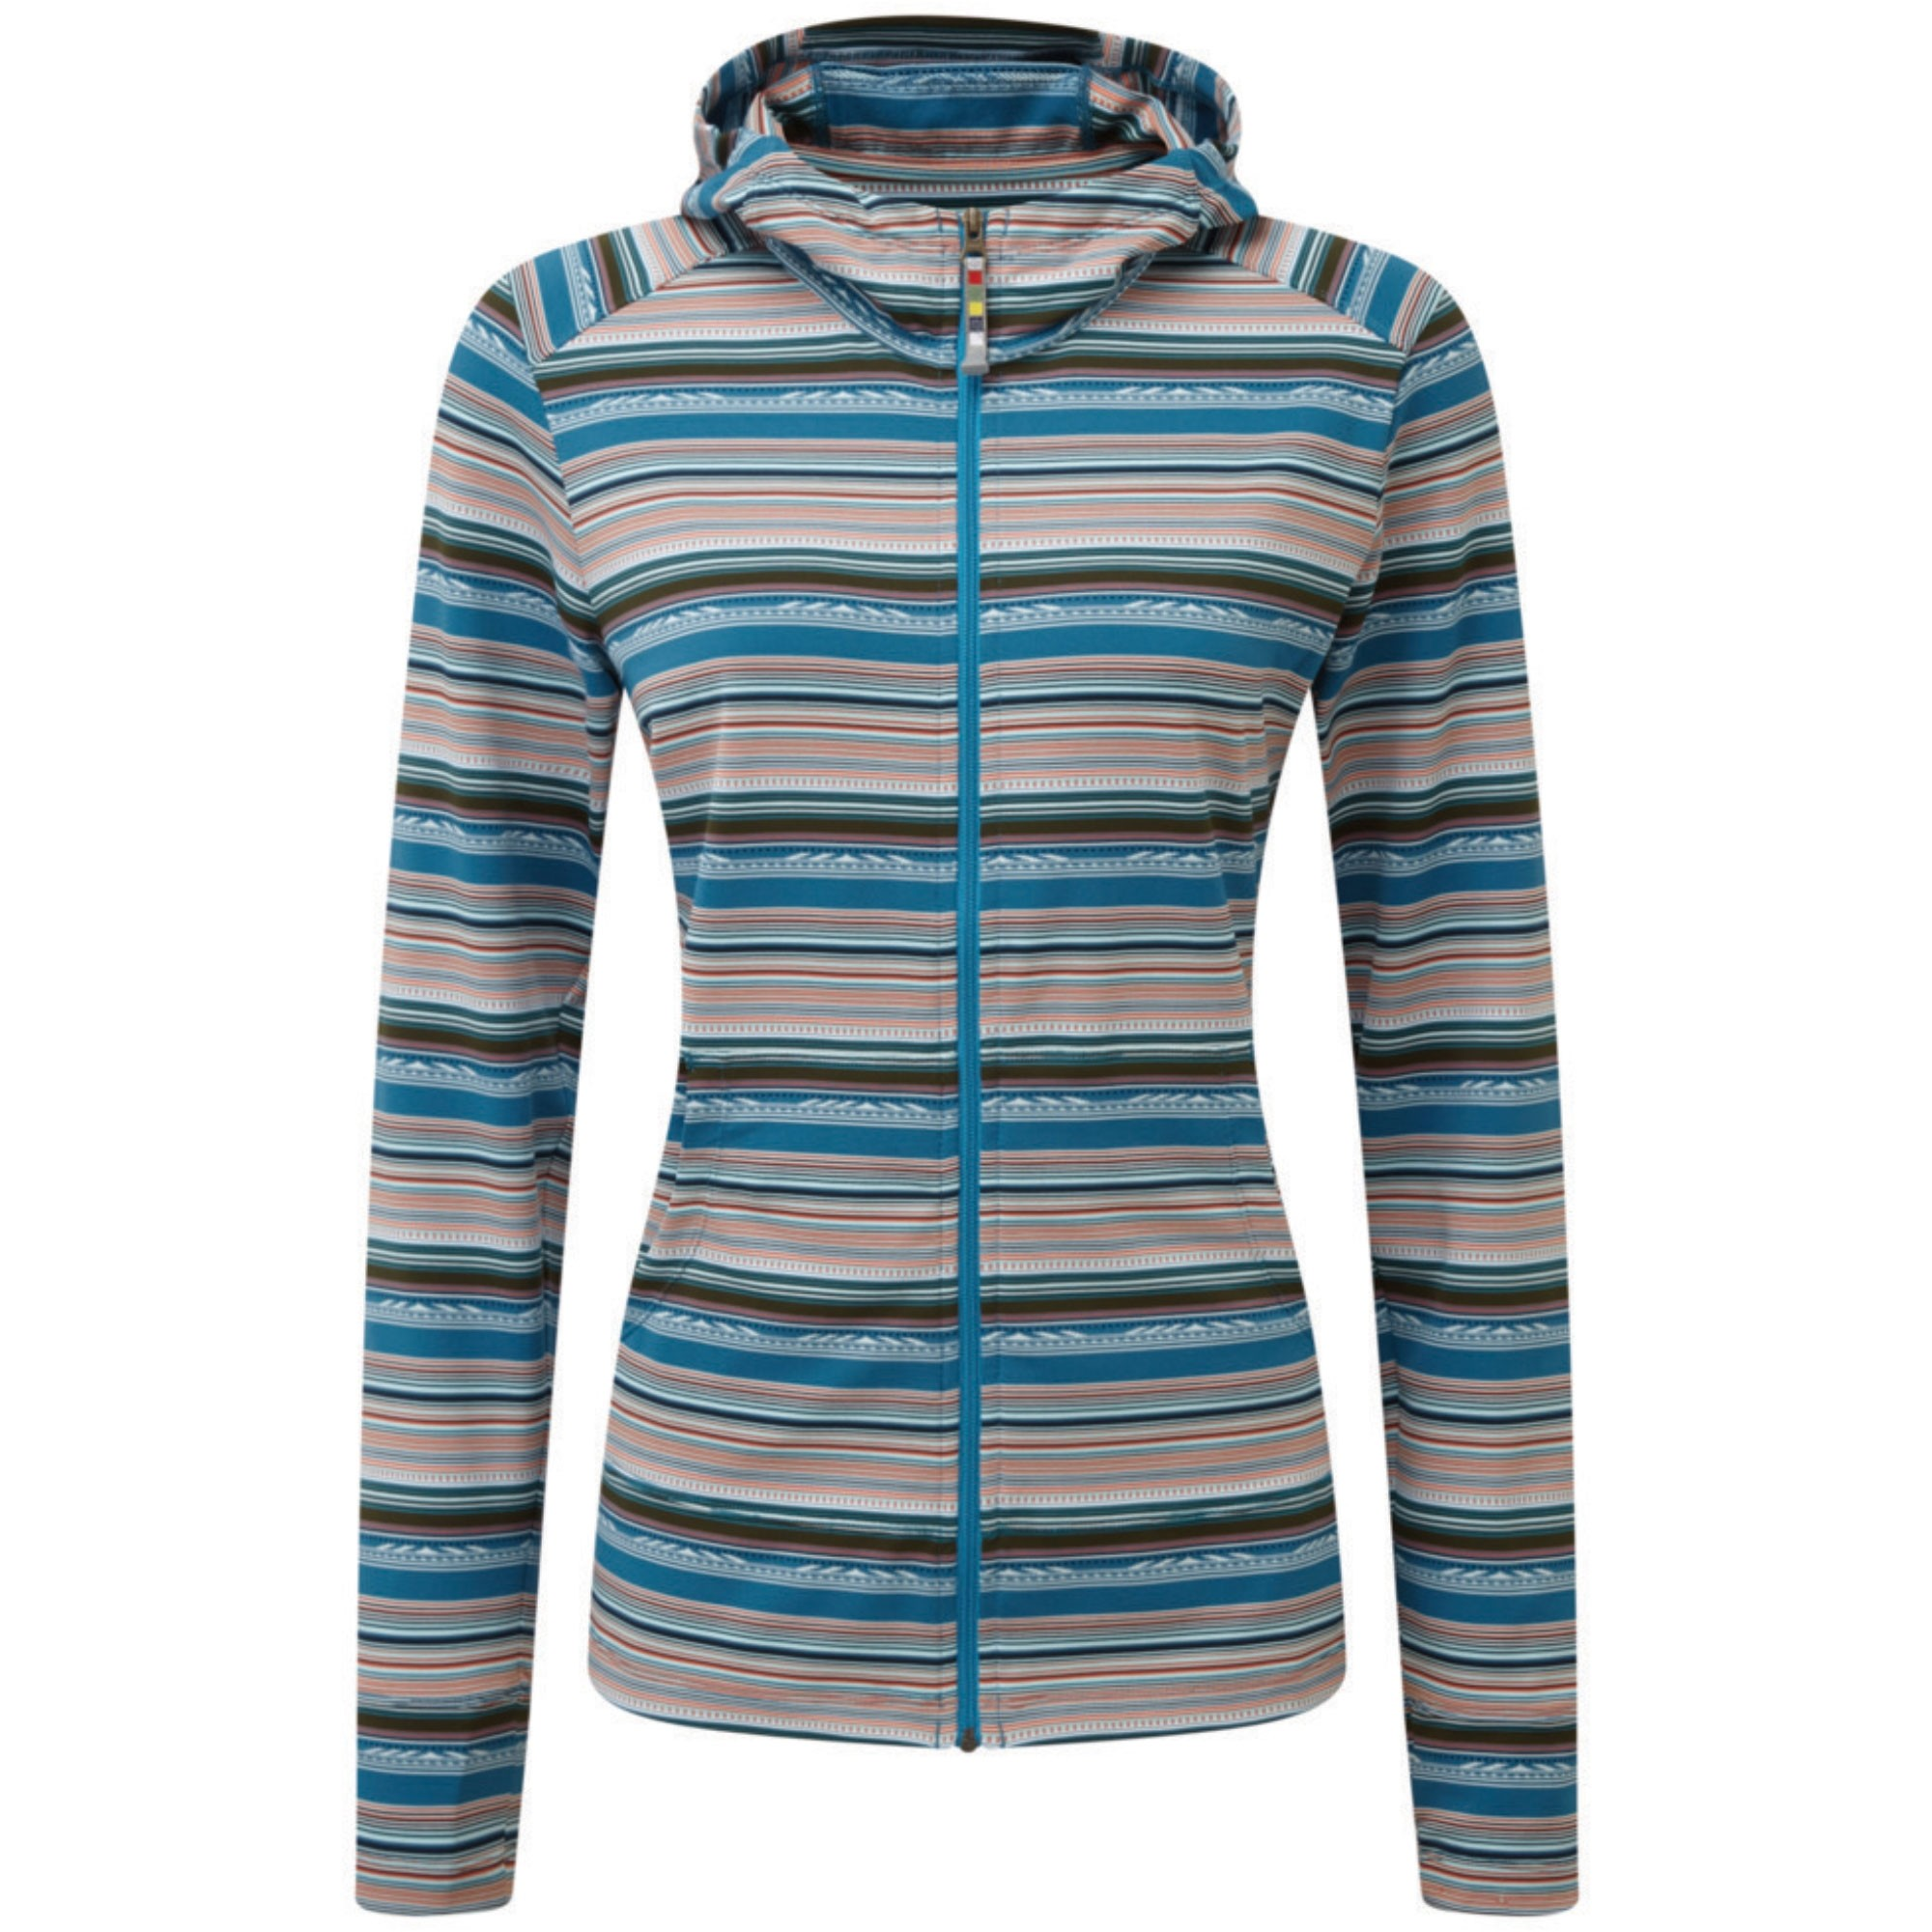 Sherpa Preeti Jacket - Blue Tara